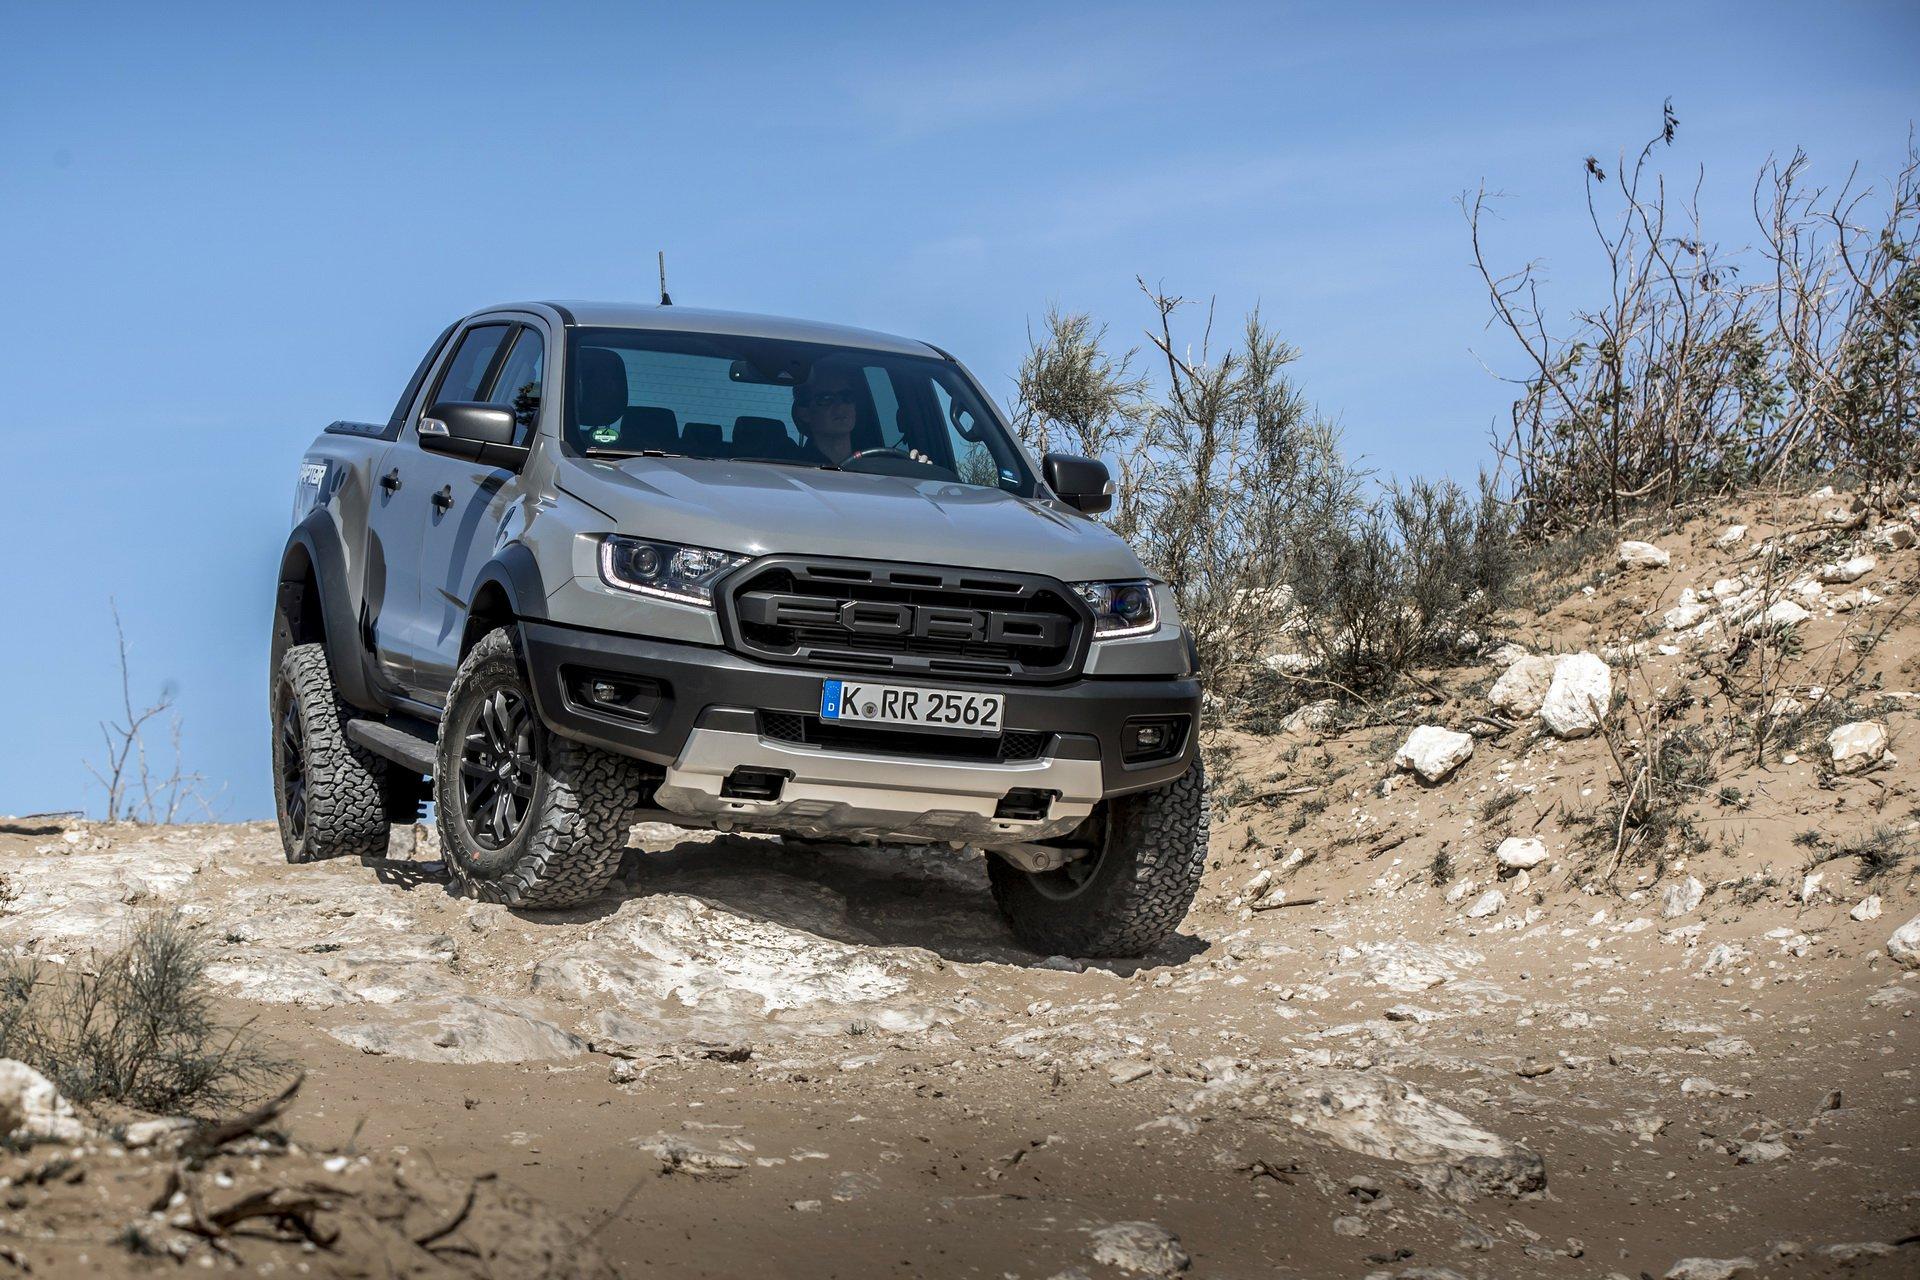 2019 Ford Ranger Raptor image gallery